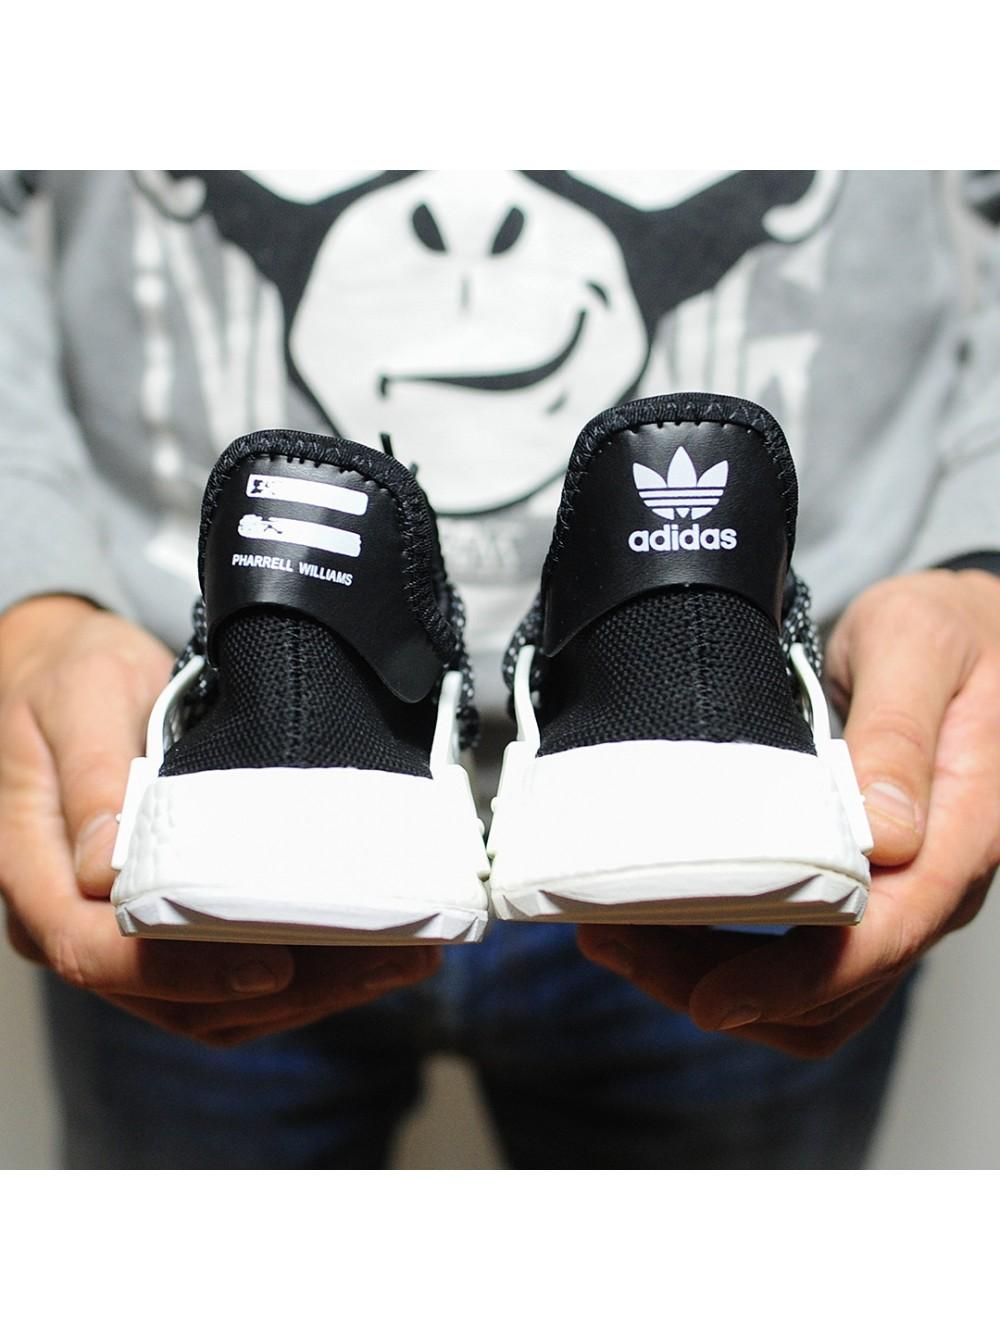 huge discount 8d379 dccee Кроссовки Adidas Human Race NMD Pharrell x Chanel